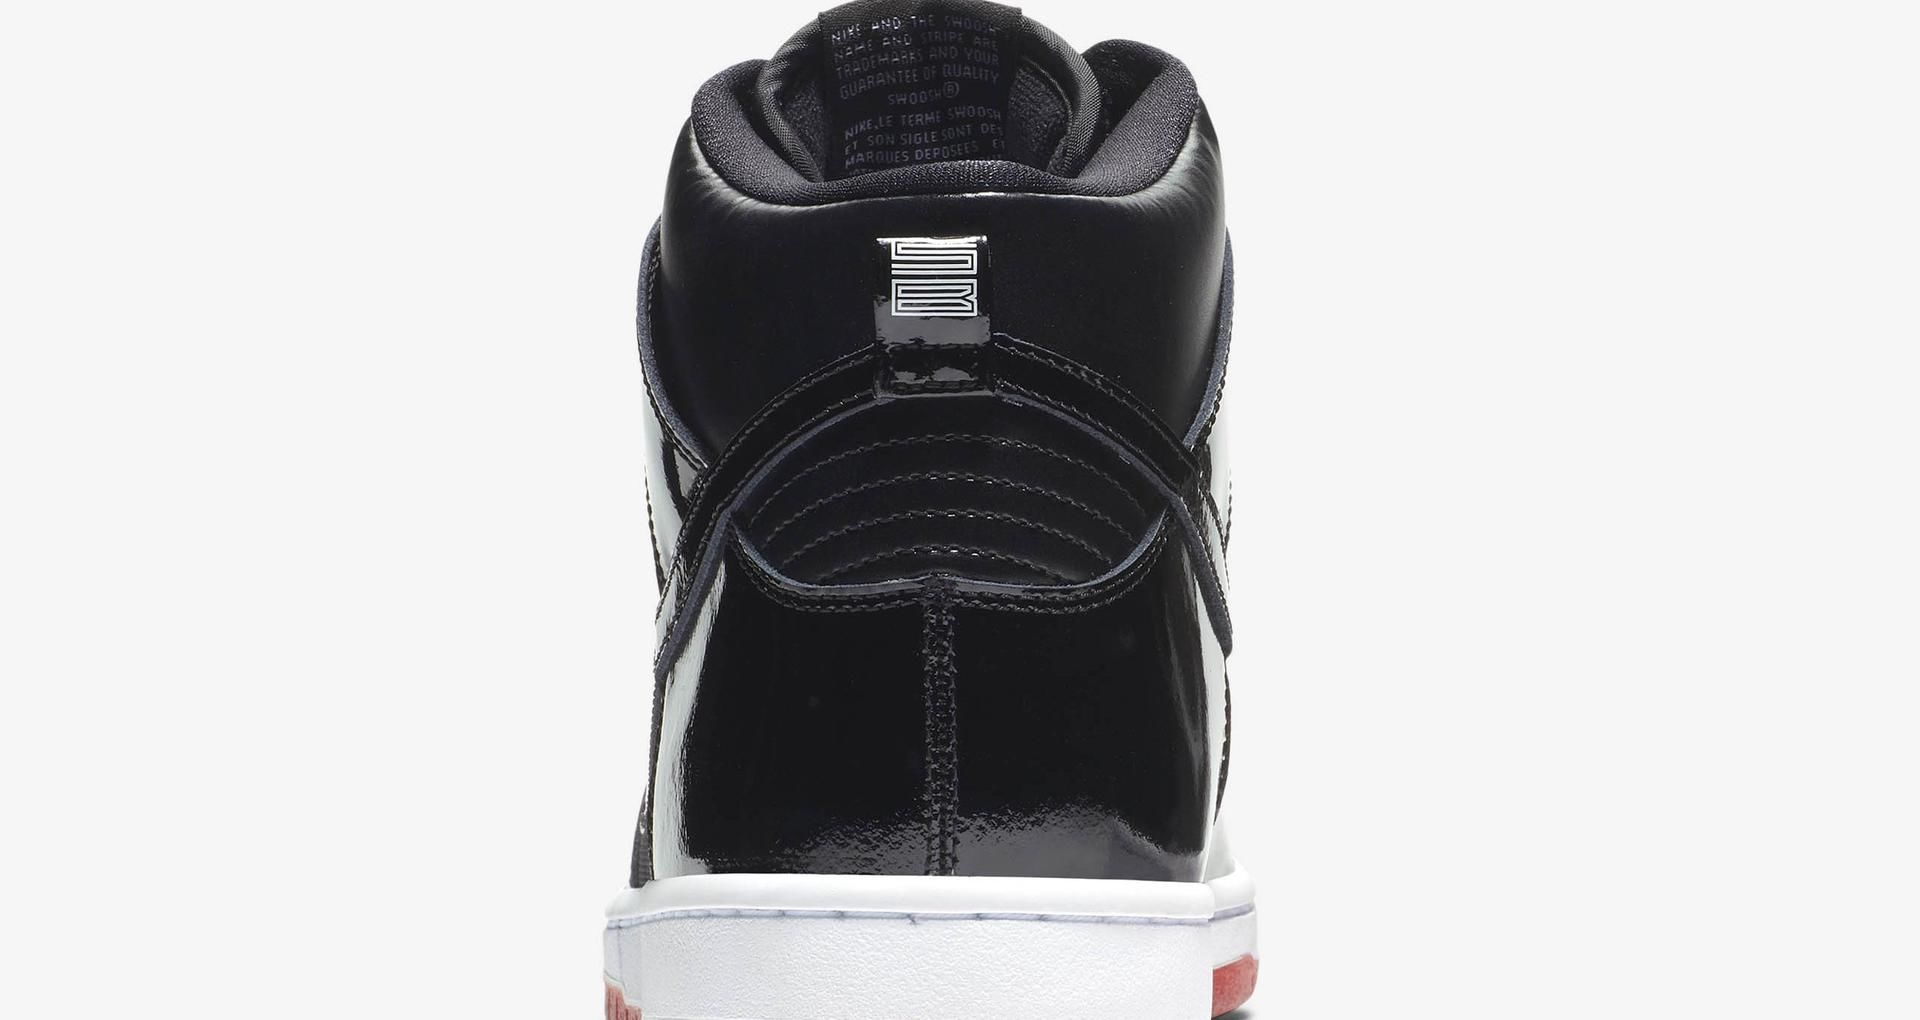 newest 58d78 b5e92 Nike SB Dunk High Jordan 11 'Rivals Pack' Release Date. Nike ...